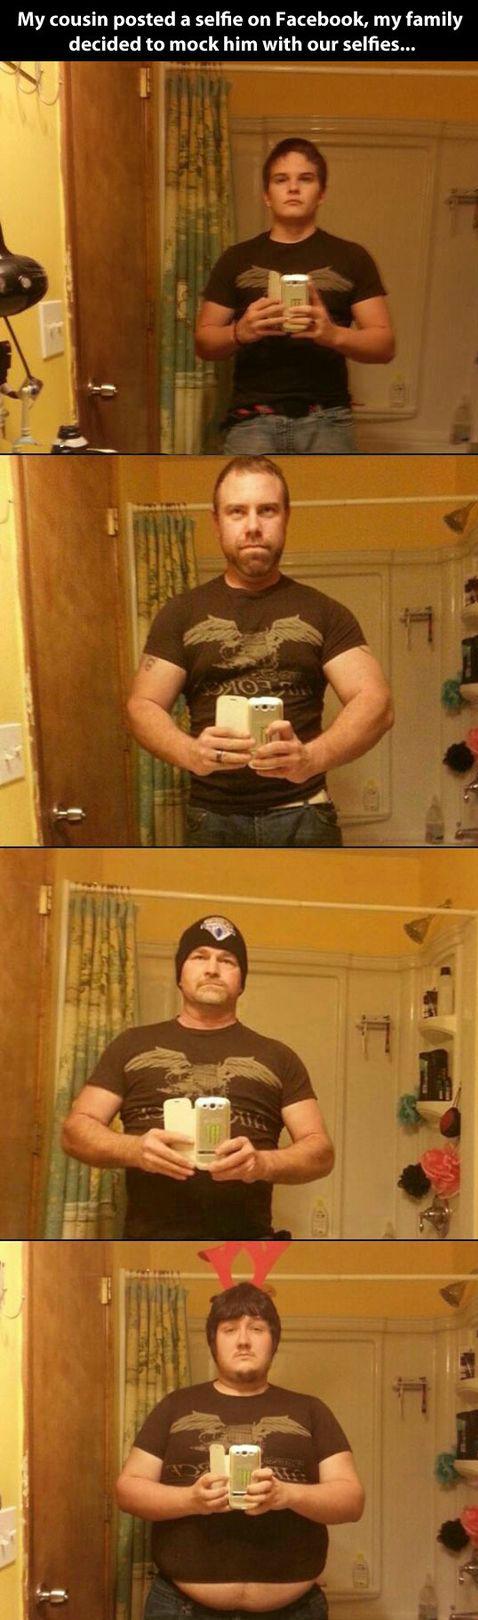 Don't do selfies, kids. .